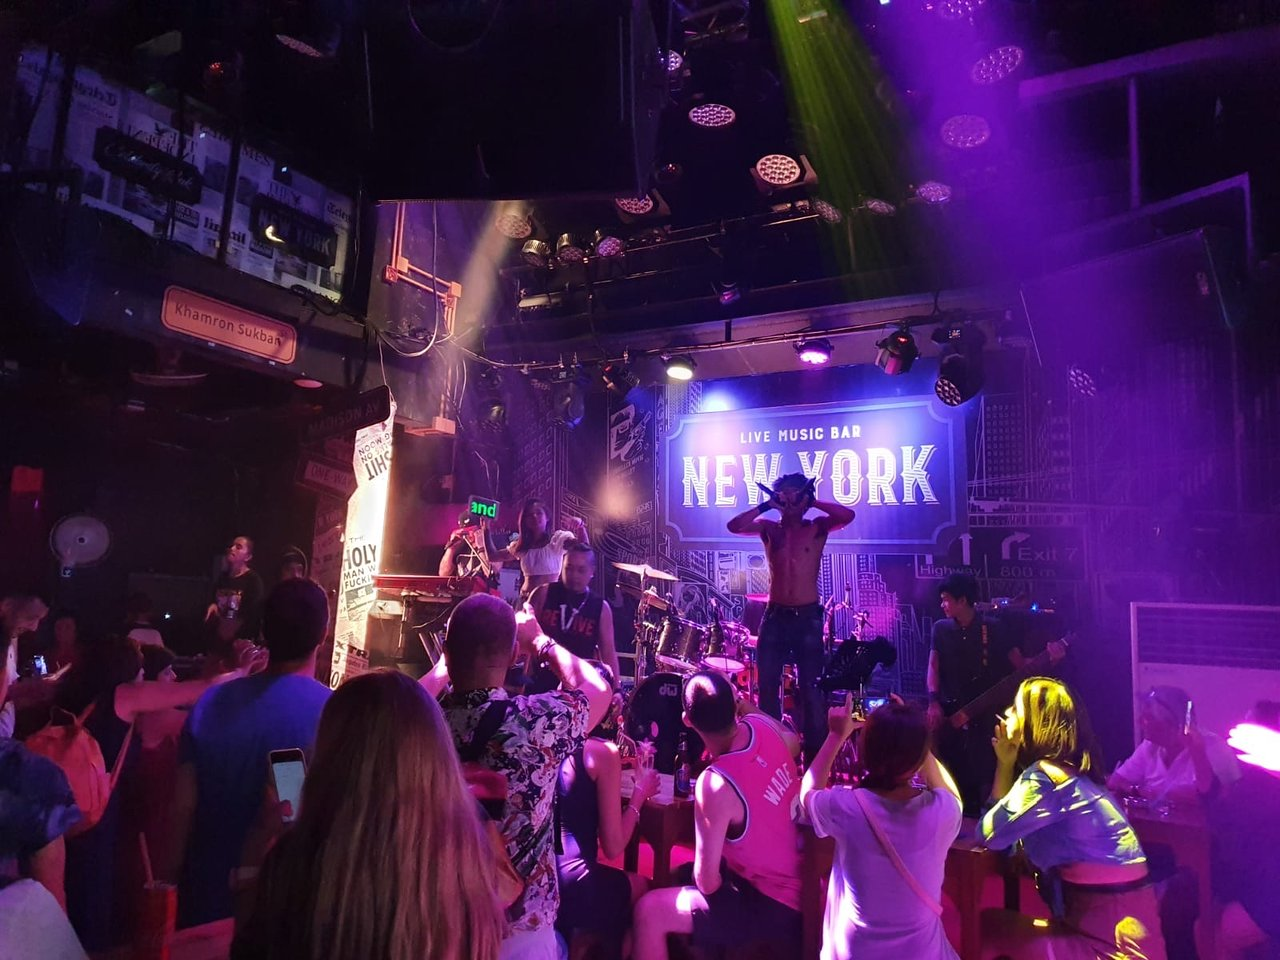 New York Bar -Top 5 famous bars in Phuket